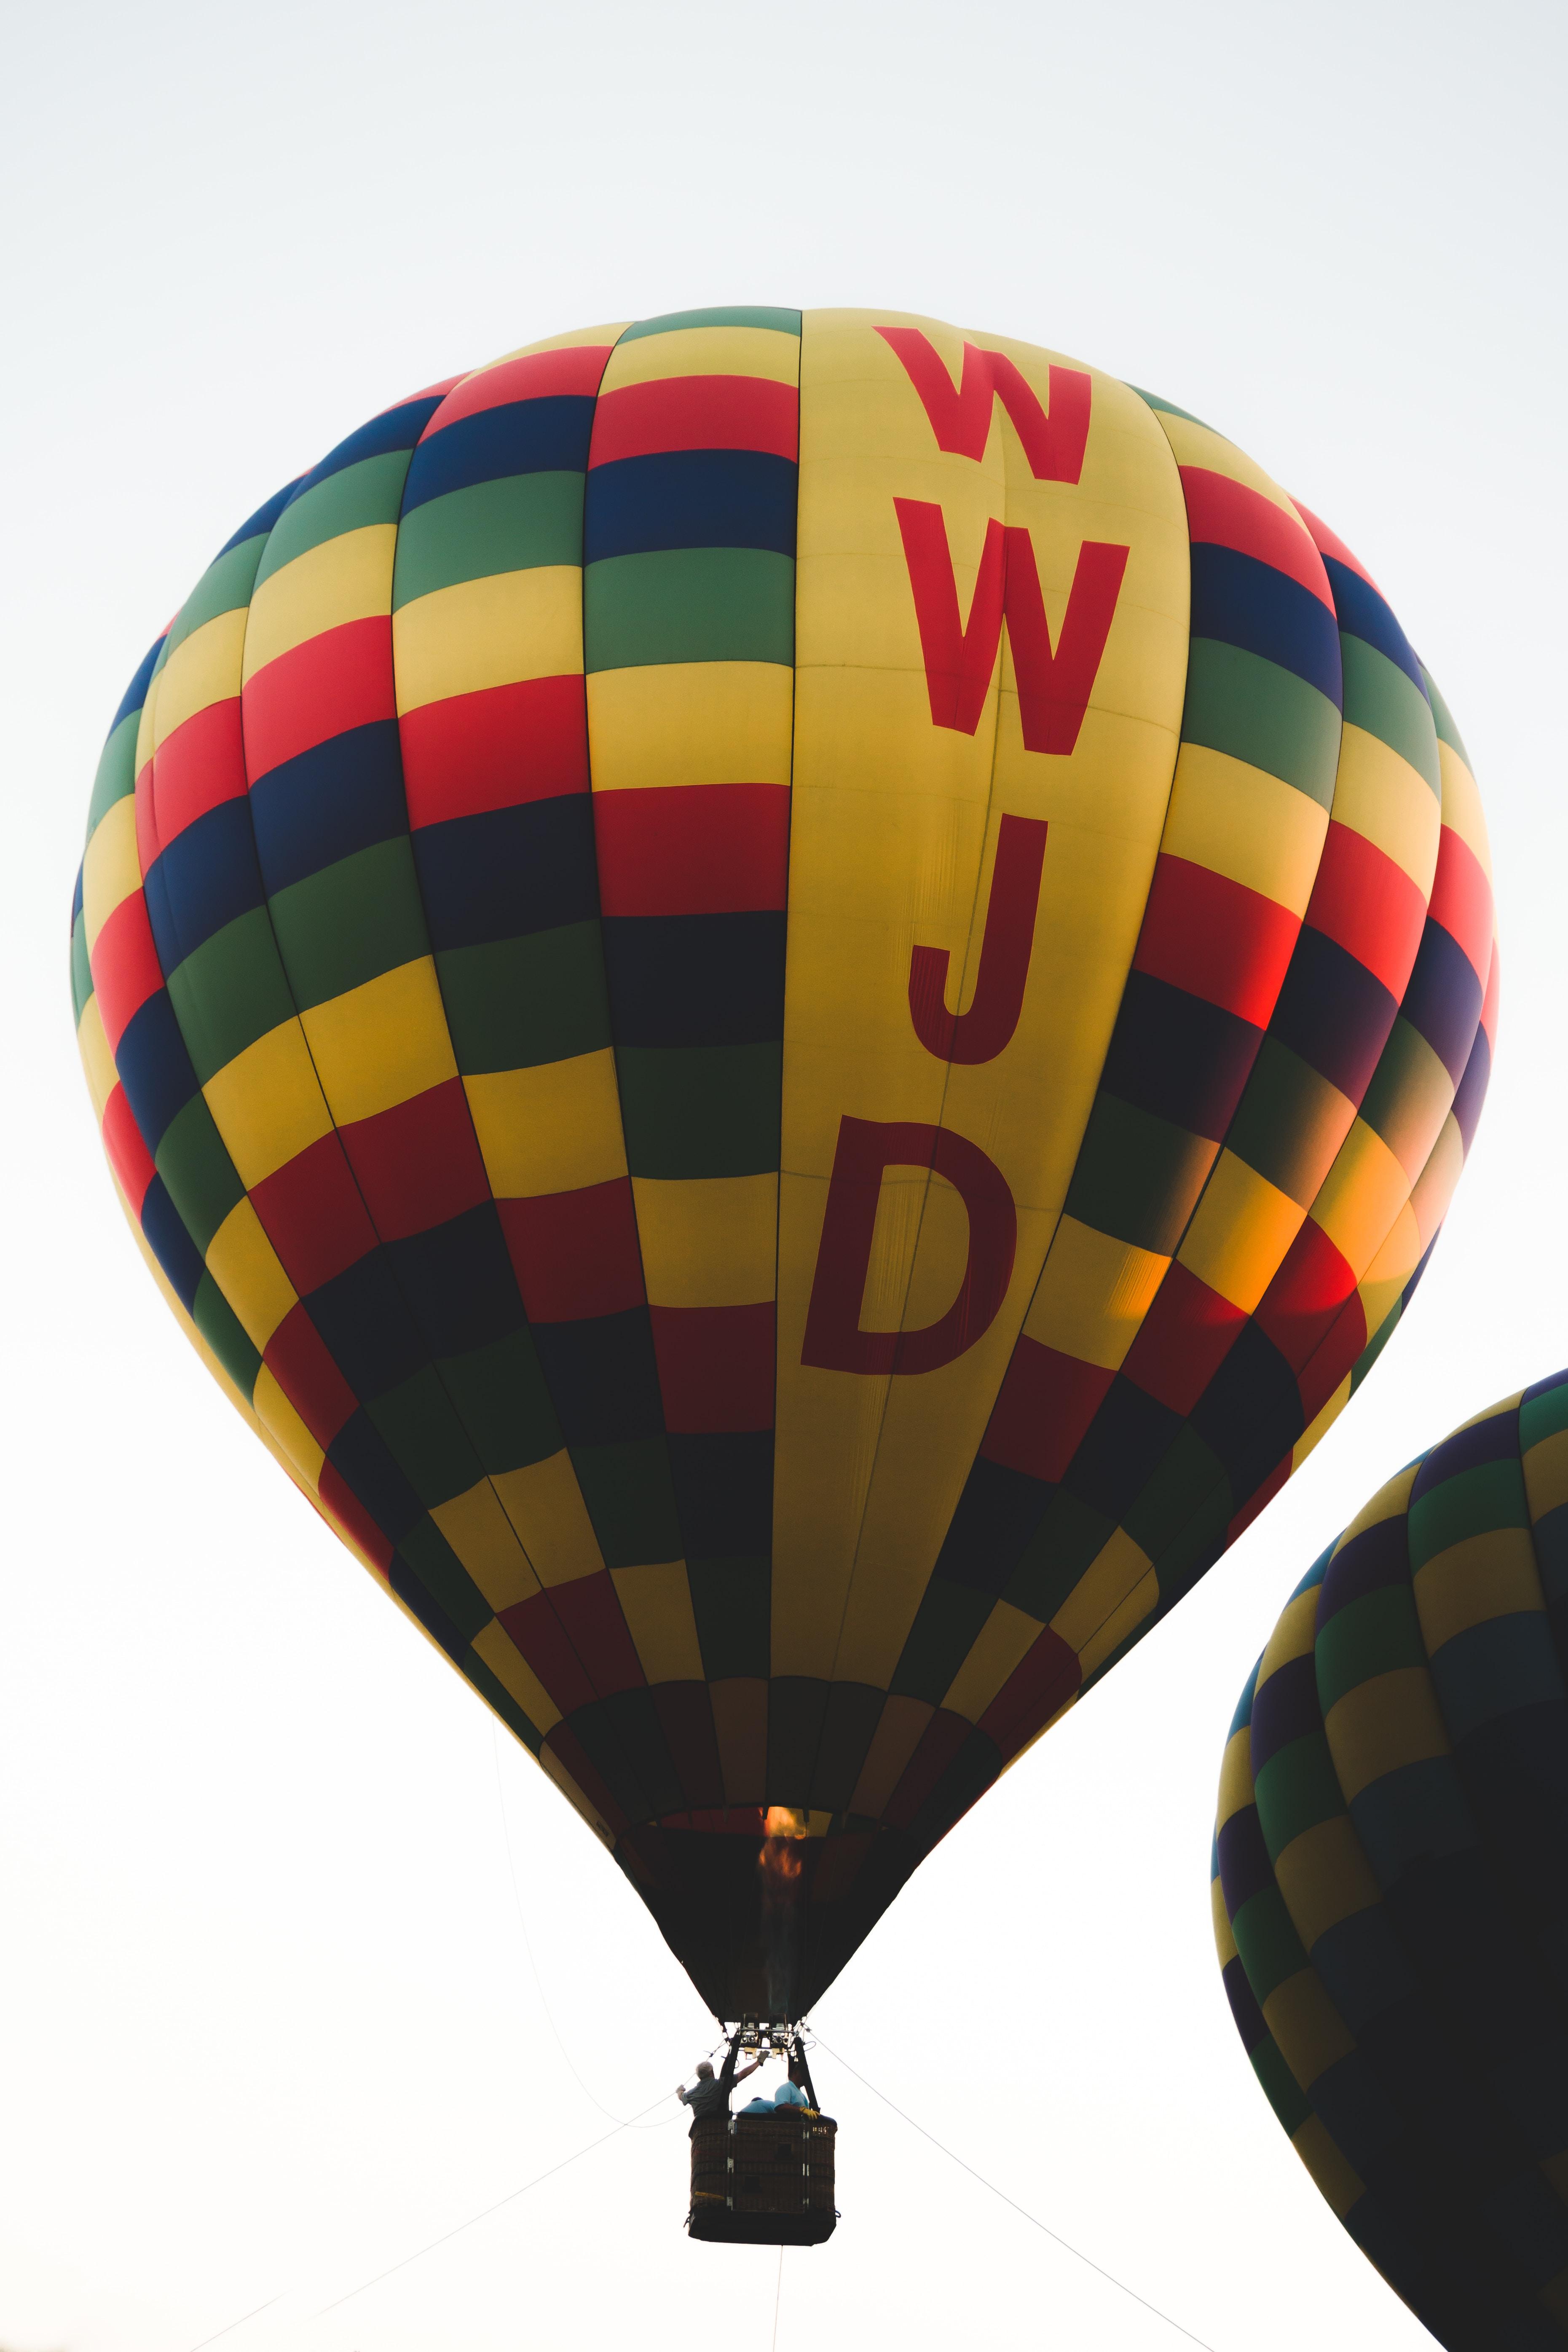 man riding on hot air balloon